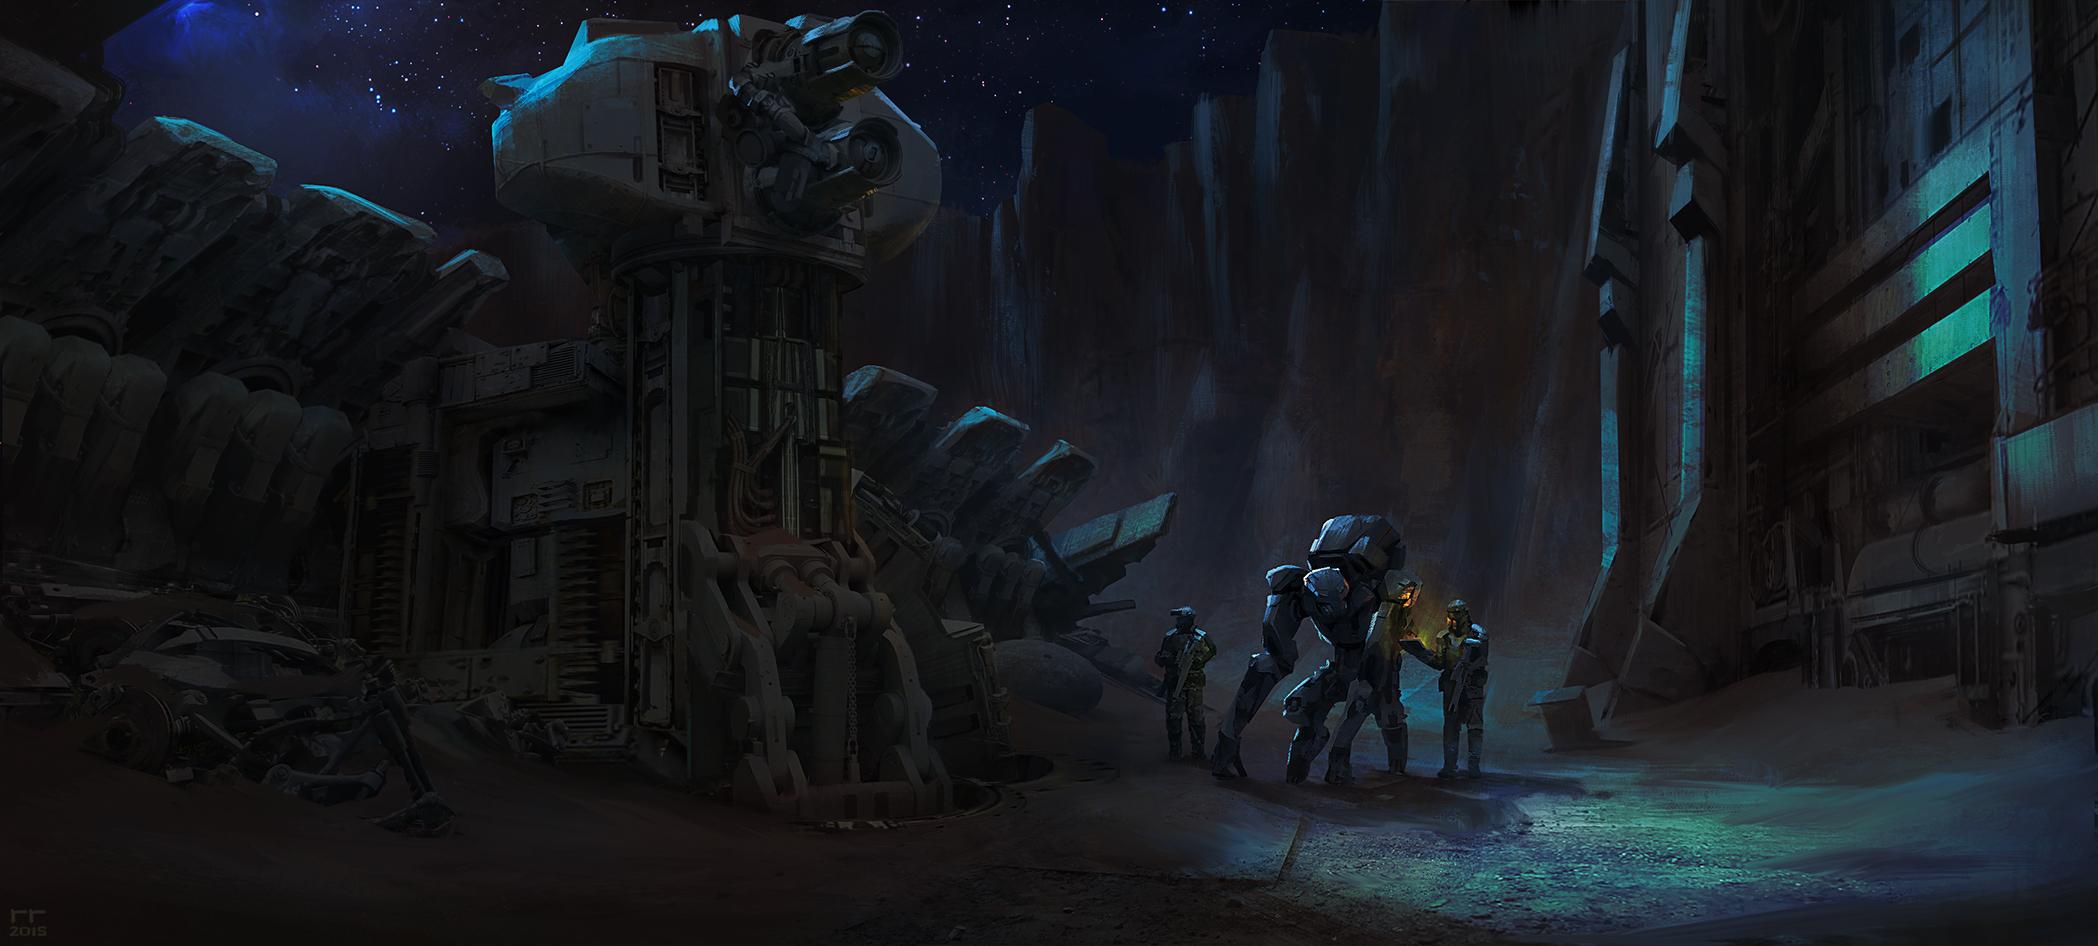 patrol_night.jpg